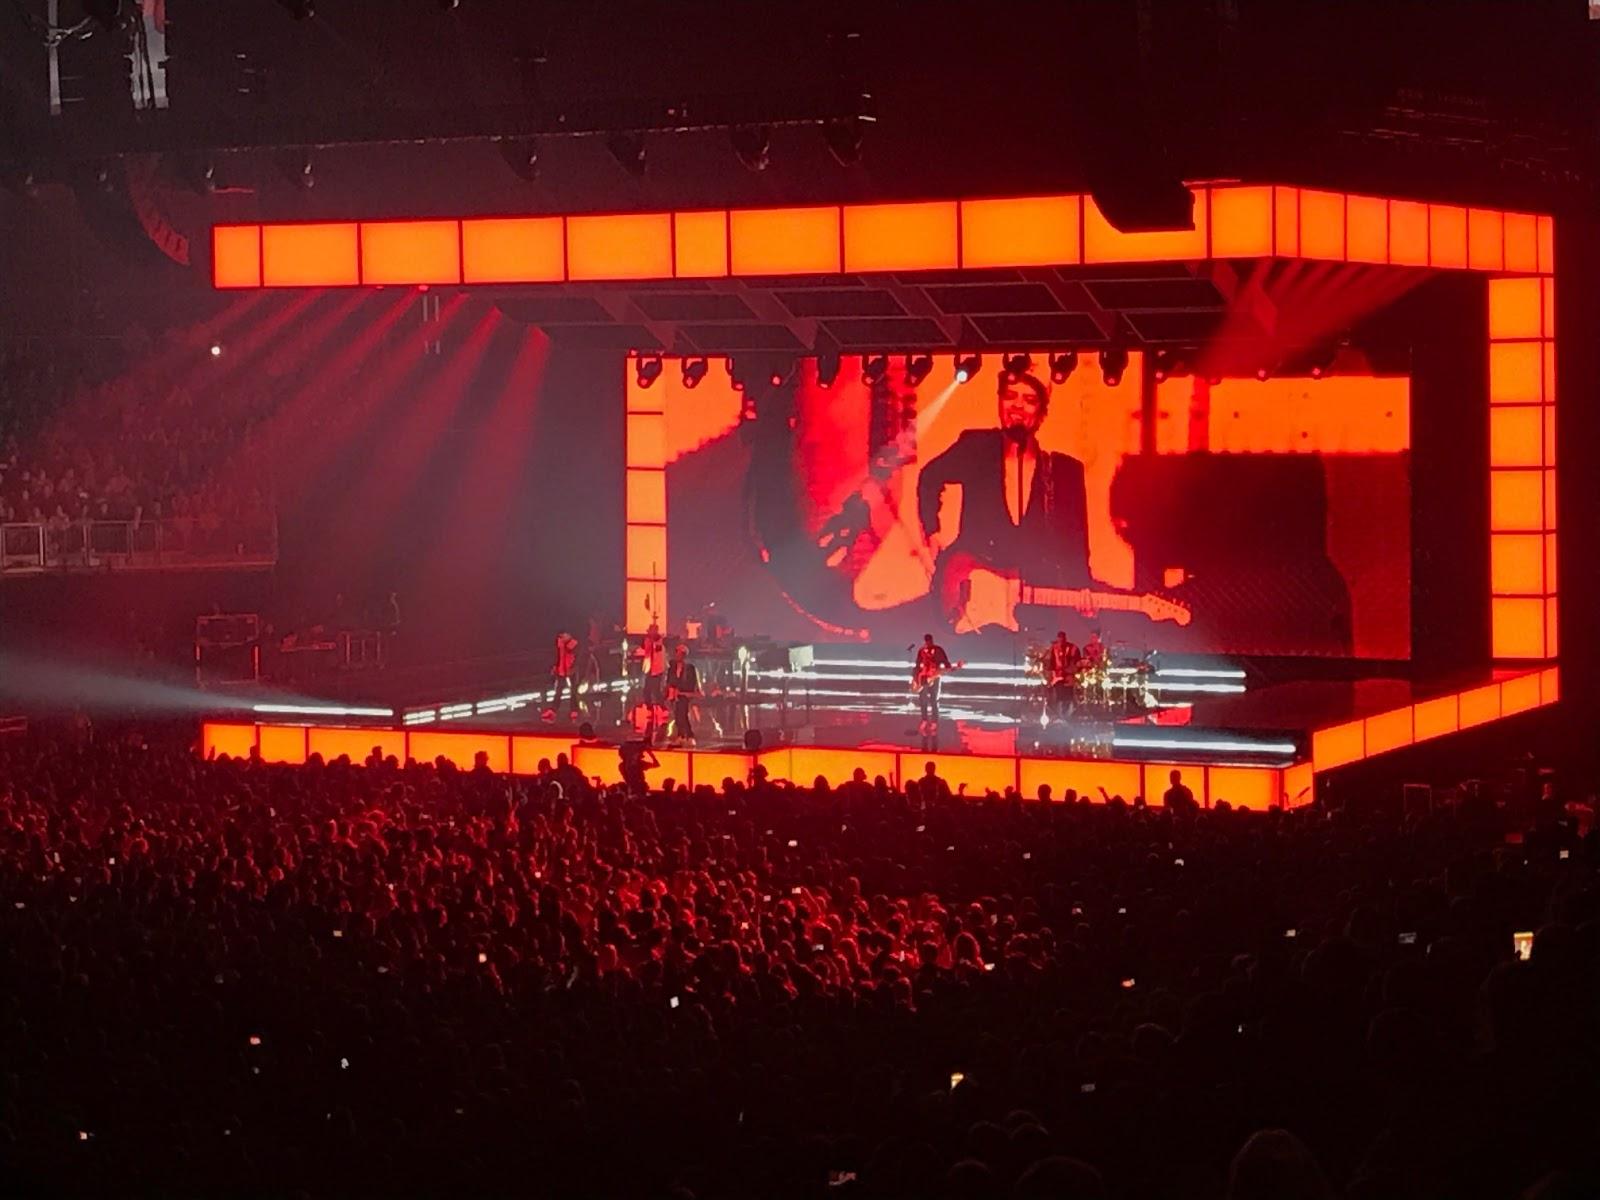 Bruno Mars - 24k Magic Tour @ O2 Arena